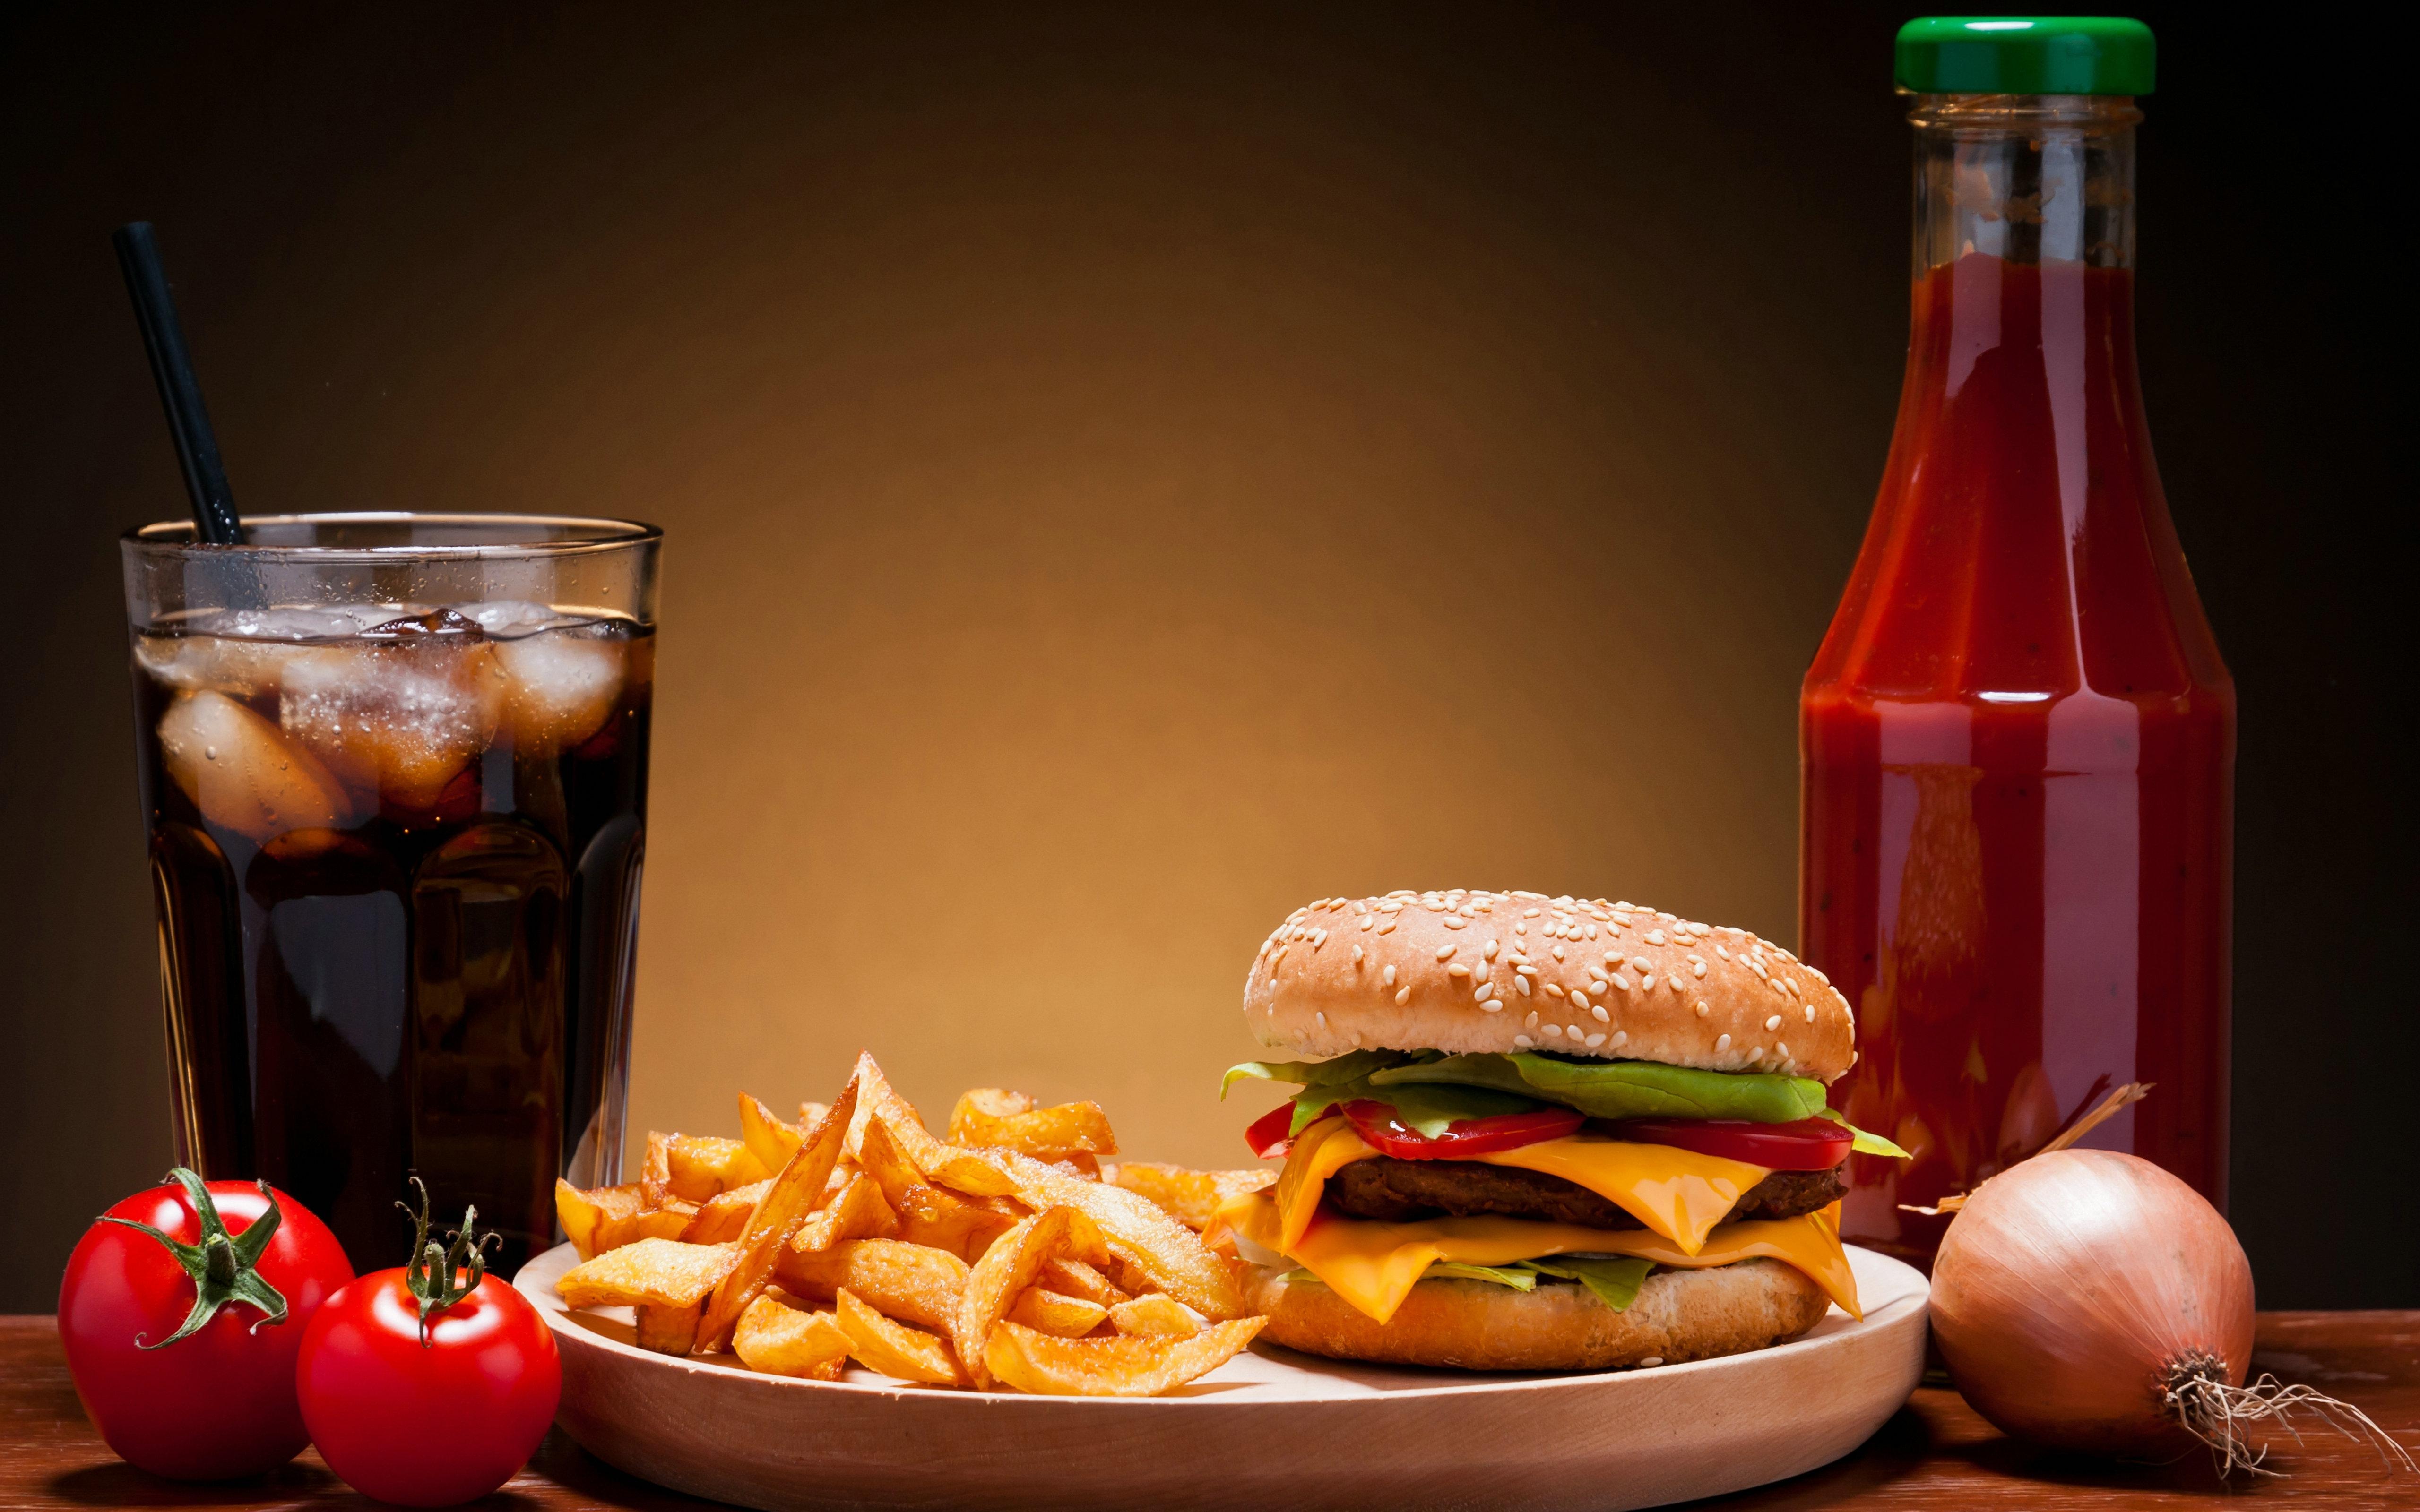 Cute Hamburger Wallpaper Free Food Backgrounds Pixelstalk Net